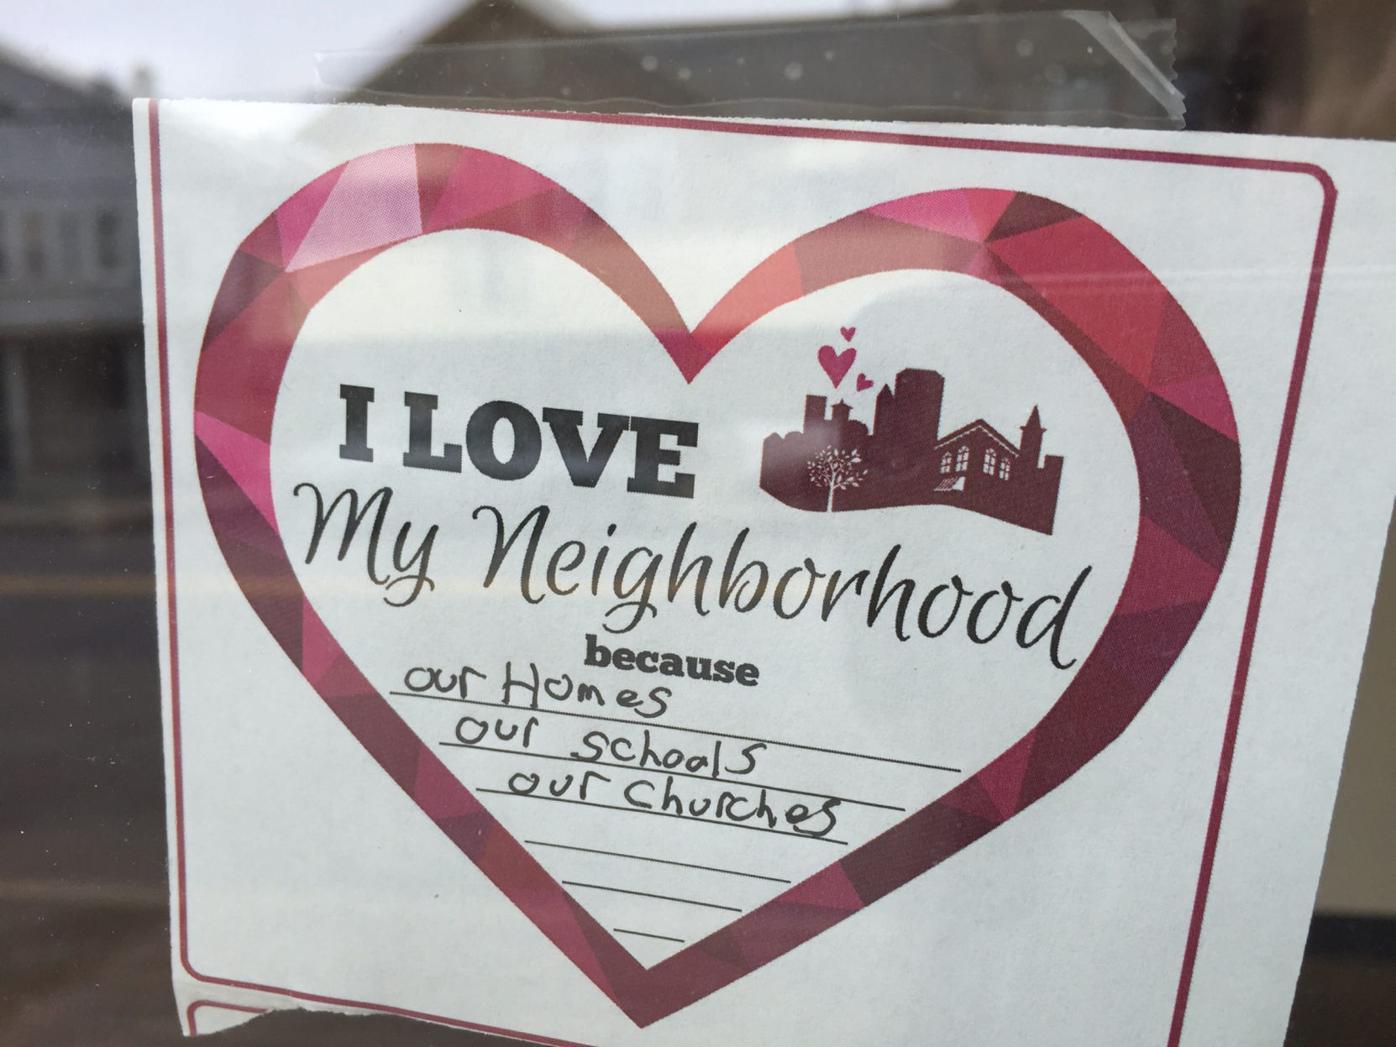 Scranton City Hall continues outreach to neighborhoods